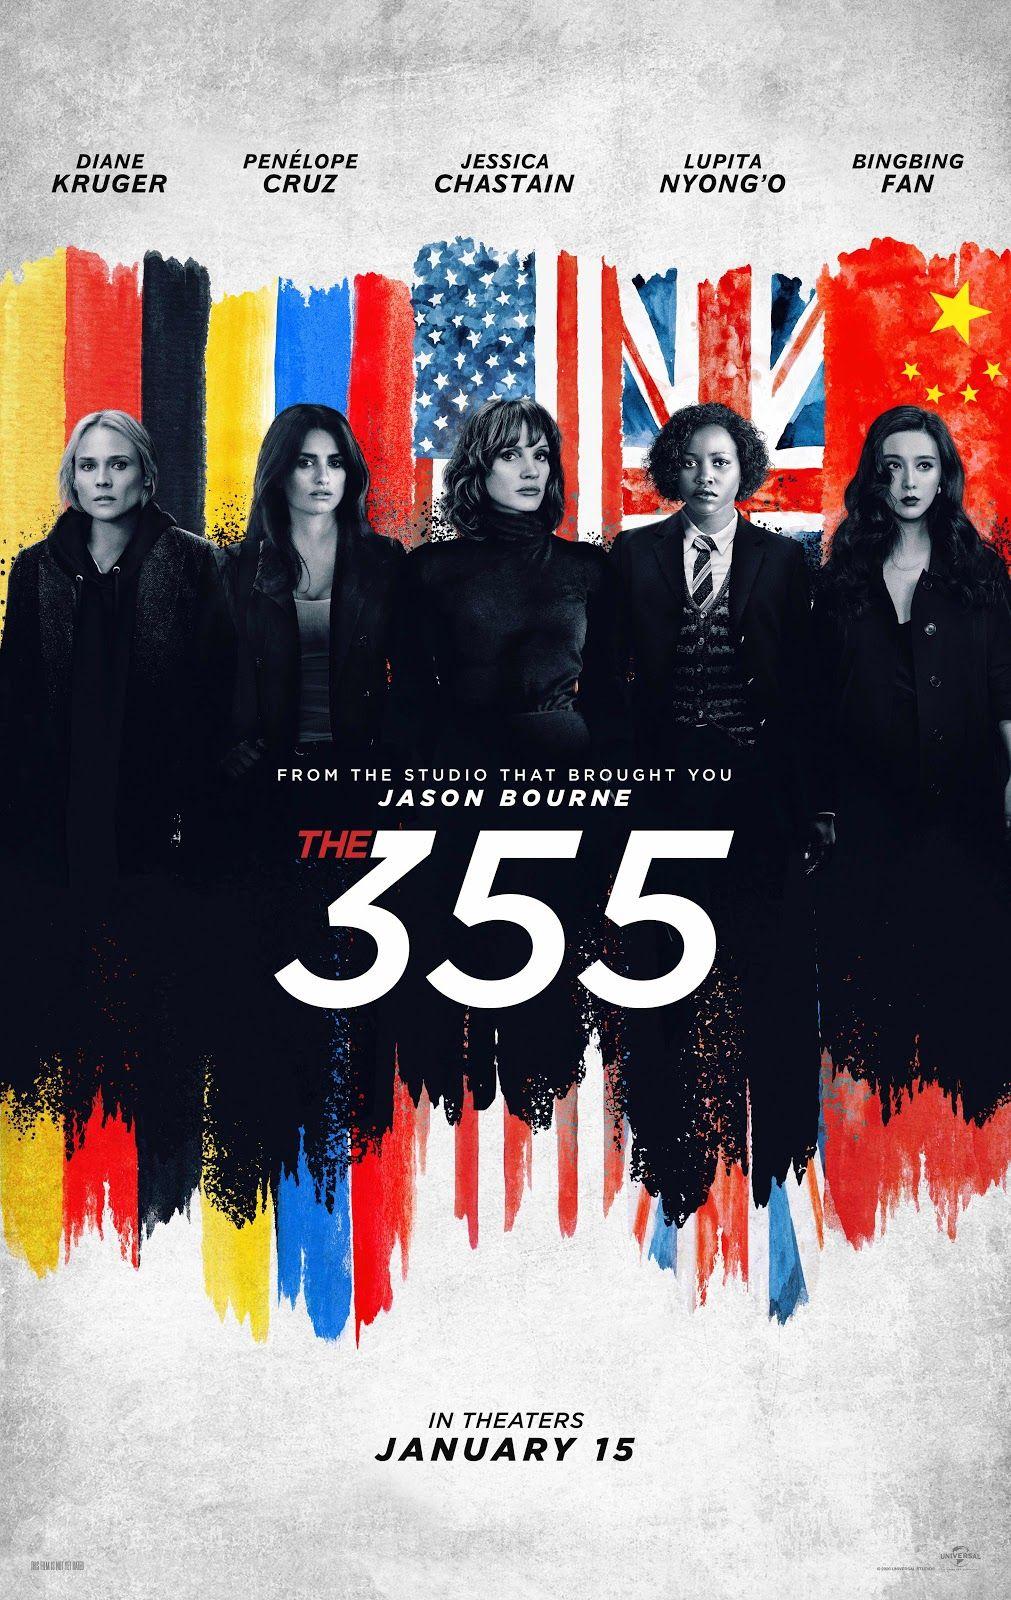 Watch The Trailer For The 355 In 2020 Penelope Cruz Jessica Chastain Sebastian Stan Avengers